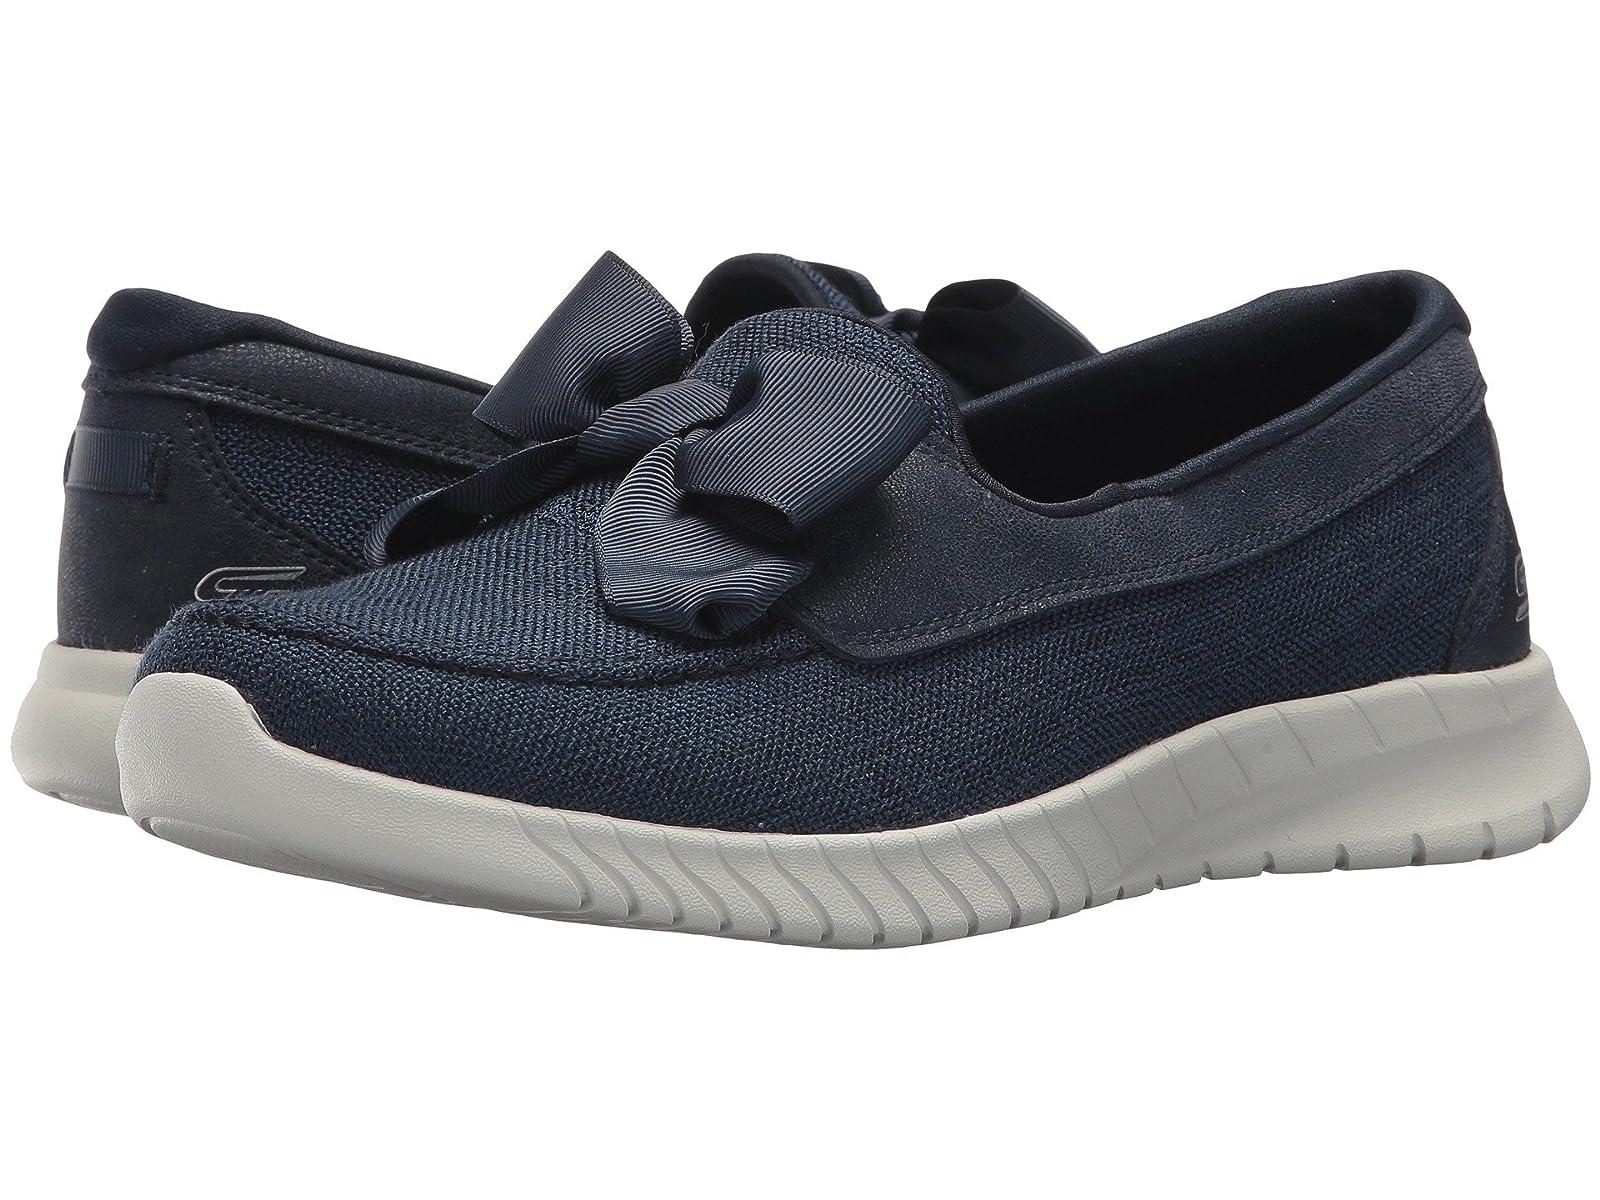 SKECHERS Wavelite - MagicalAtmospheric grades have affordable shoes